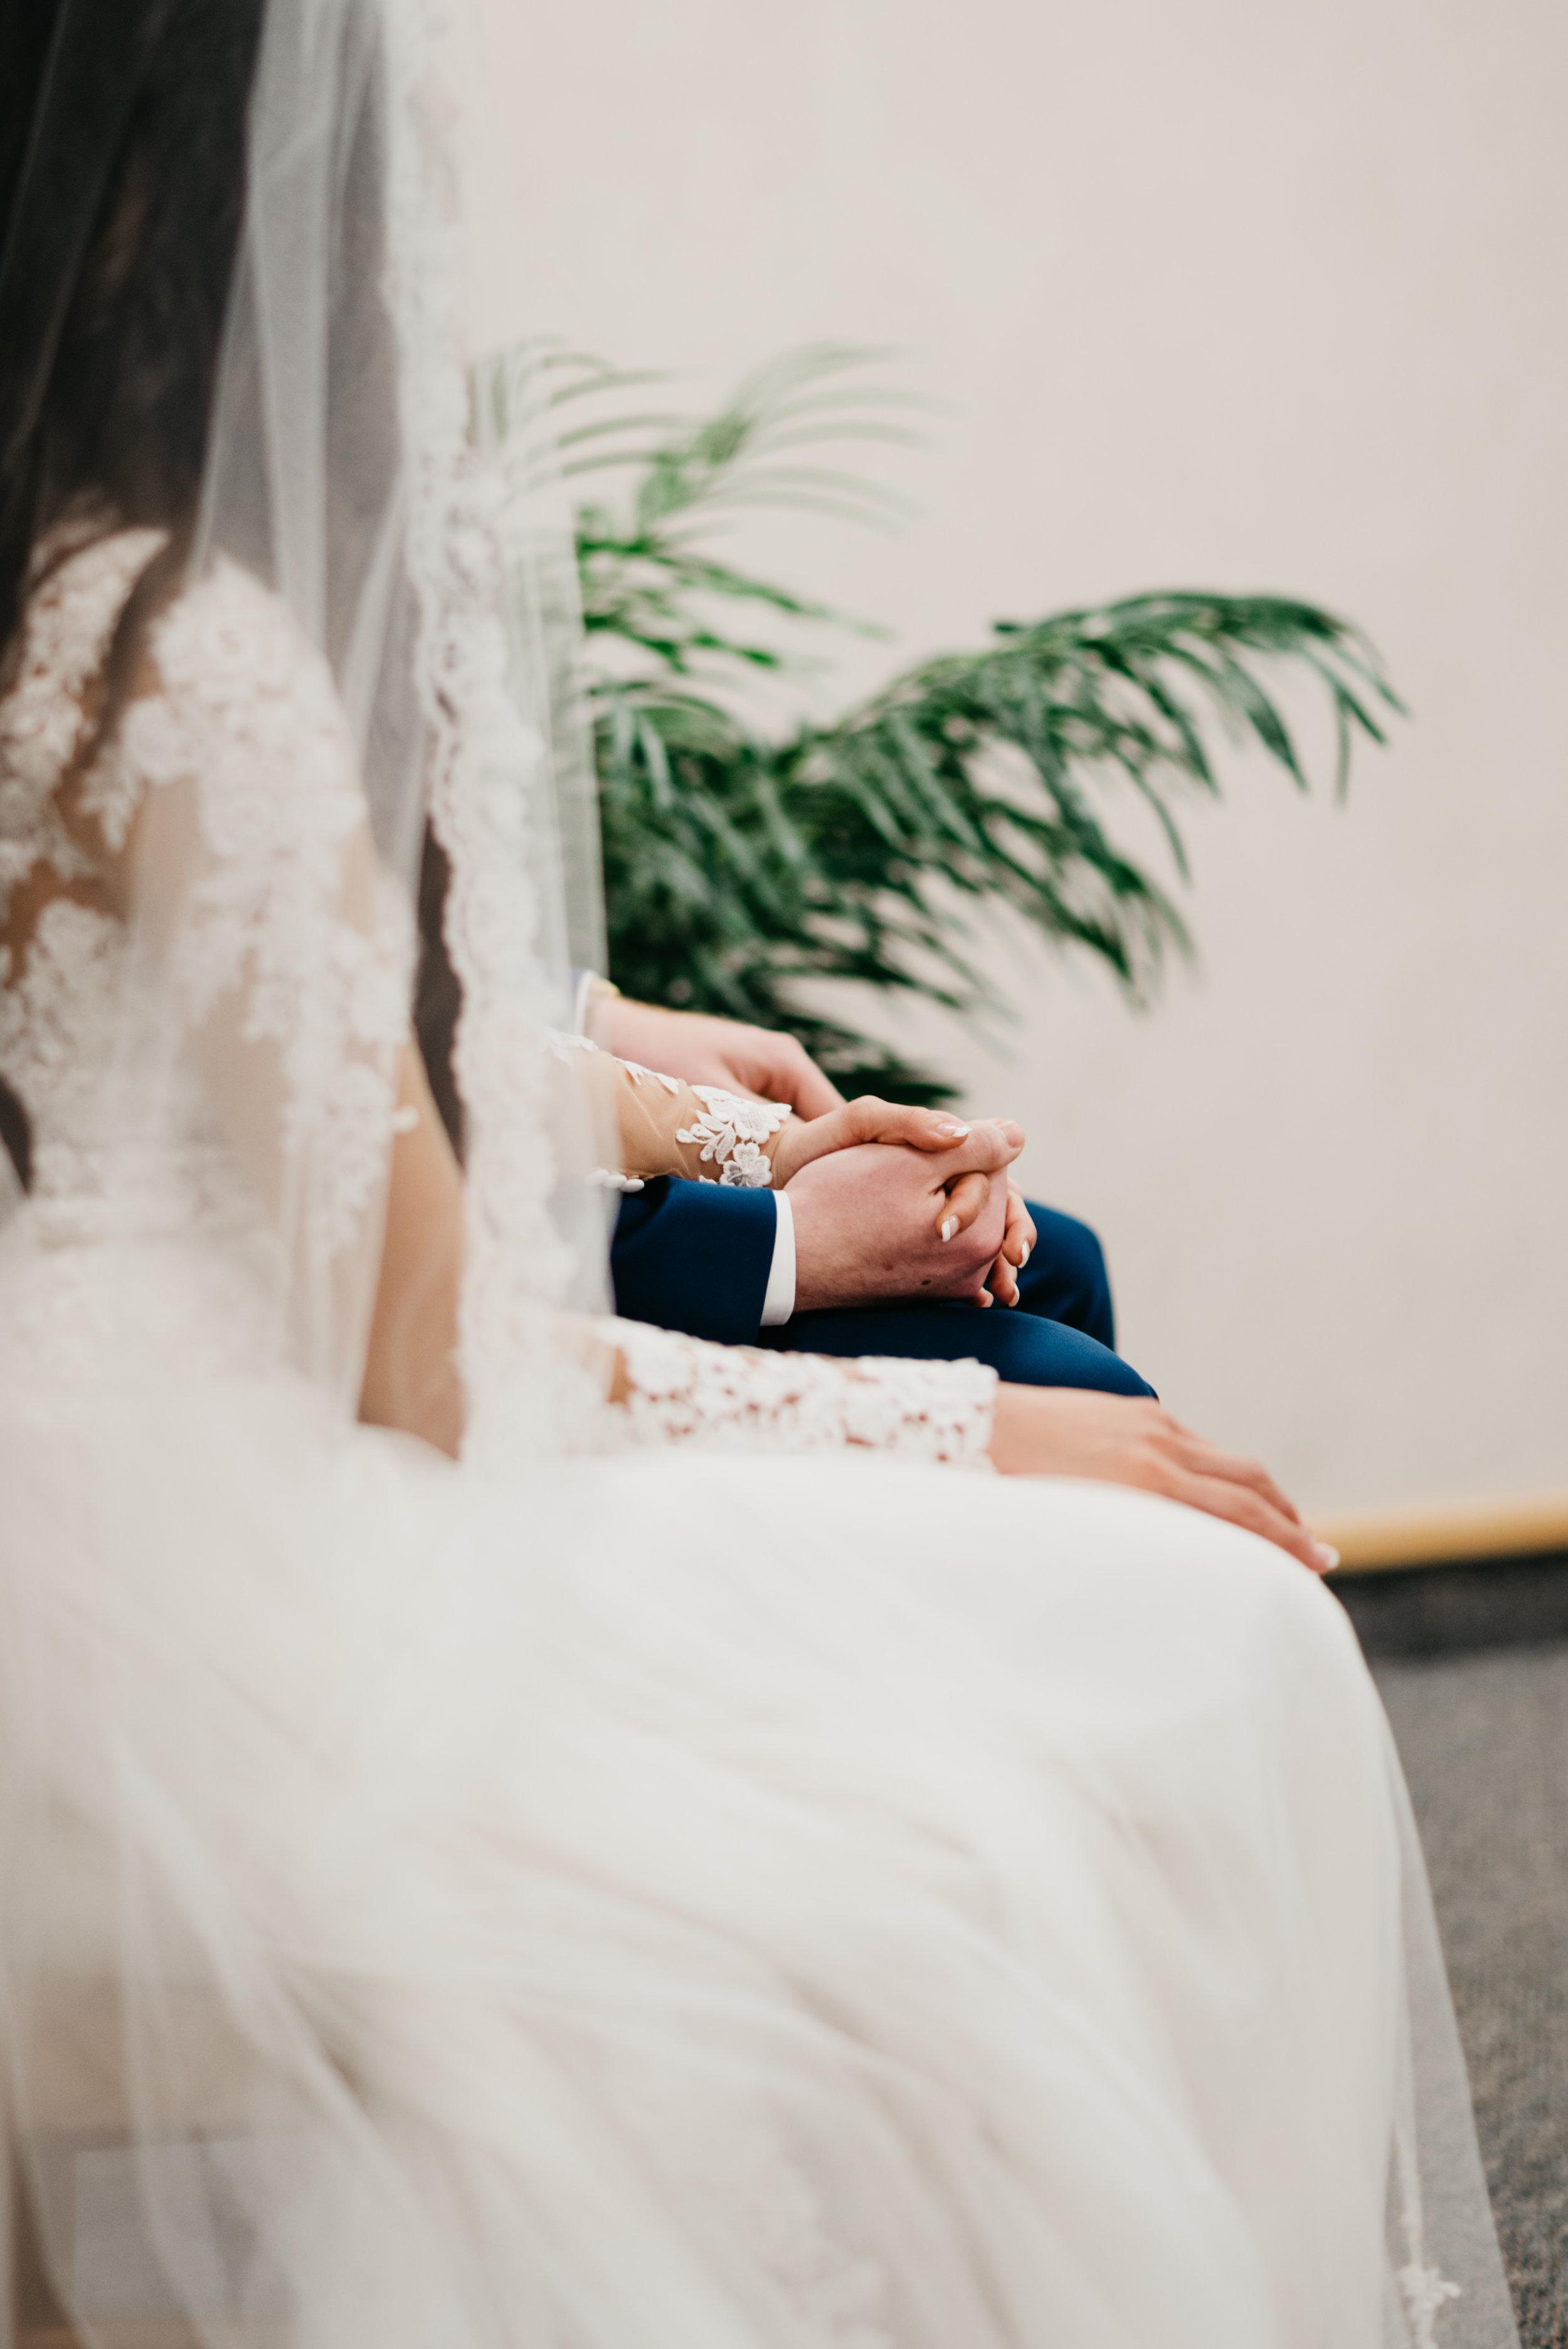 Barch-Massachusetts-Lakeside Tent Wedding-Western Massachusetts Wedding Photographer-01070.jpg